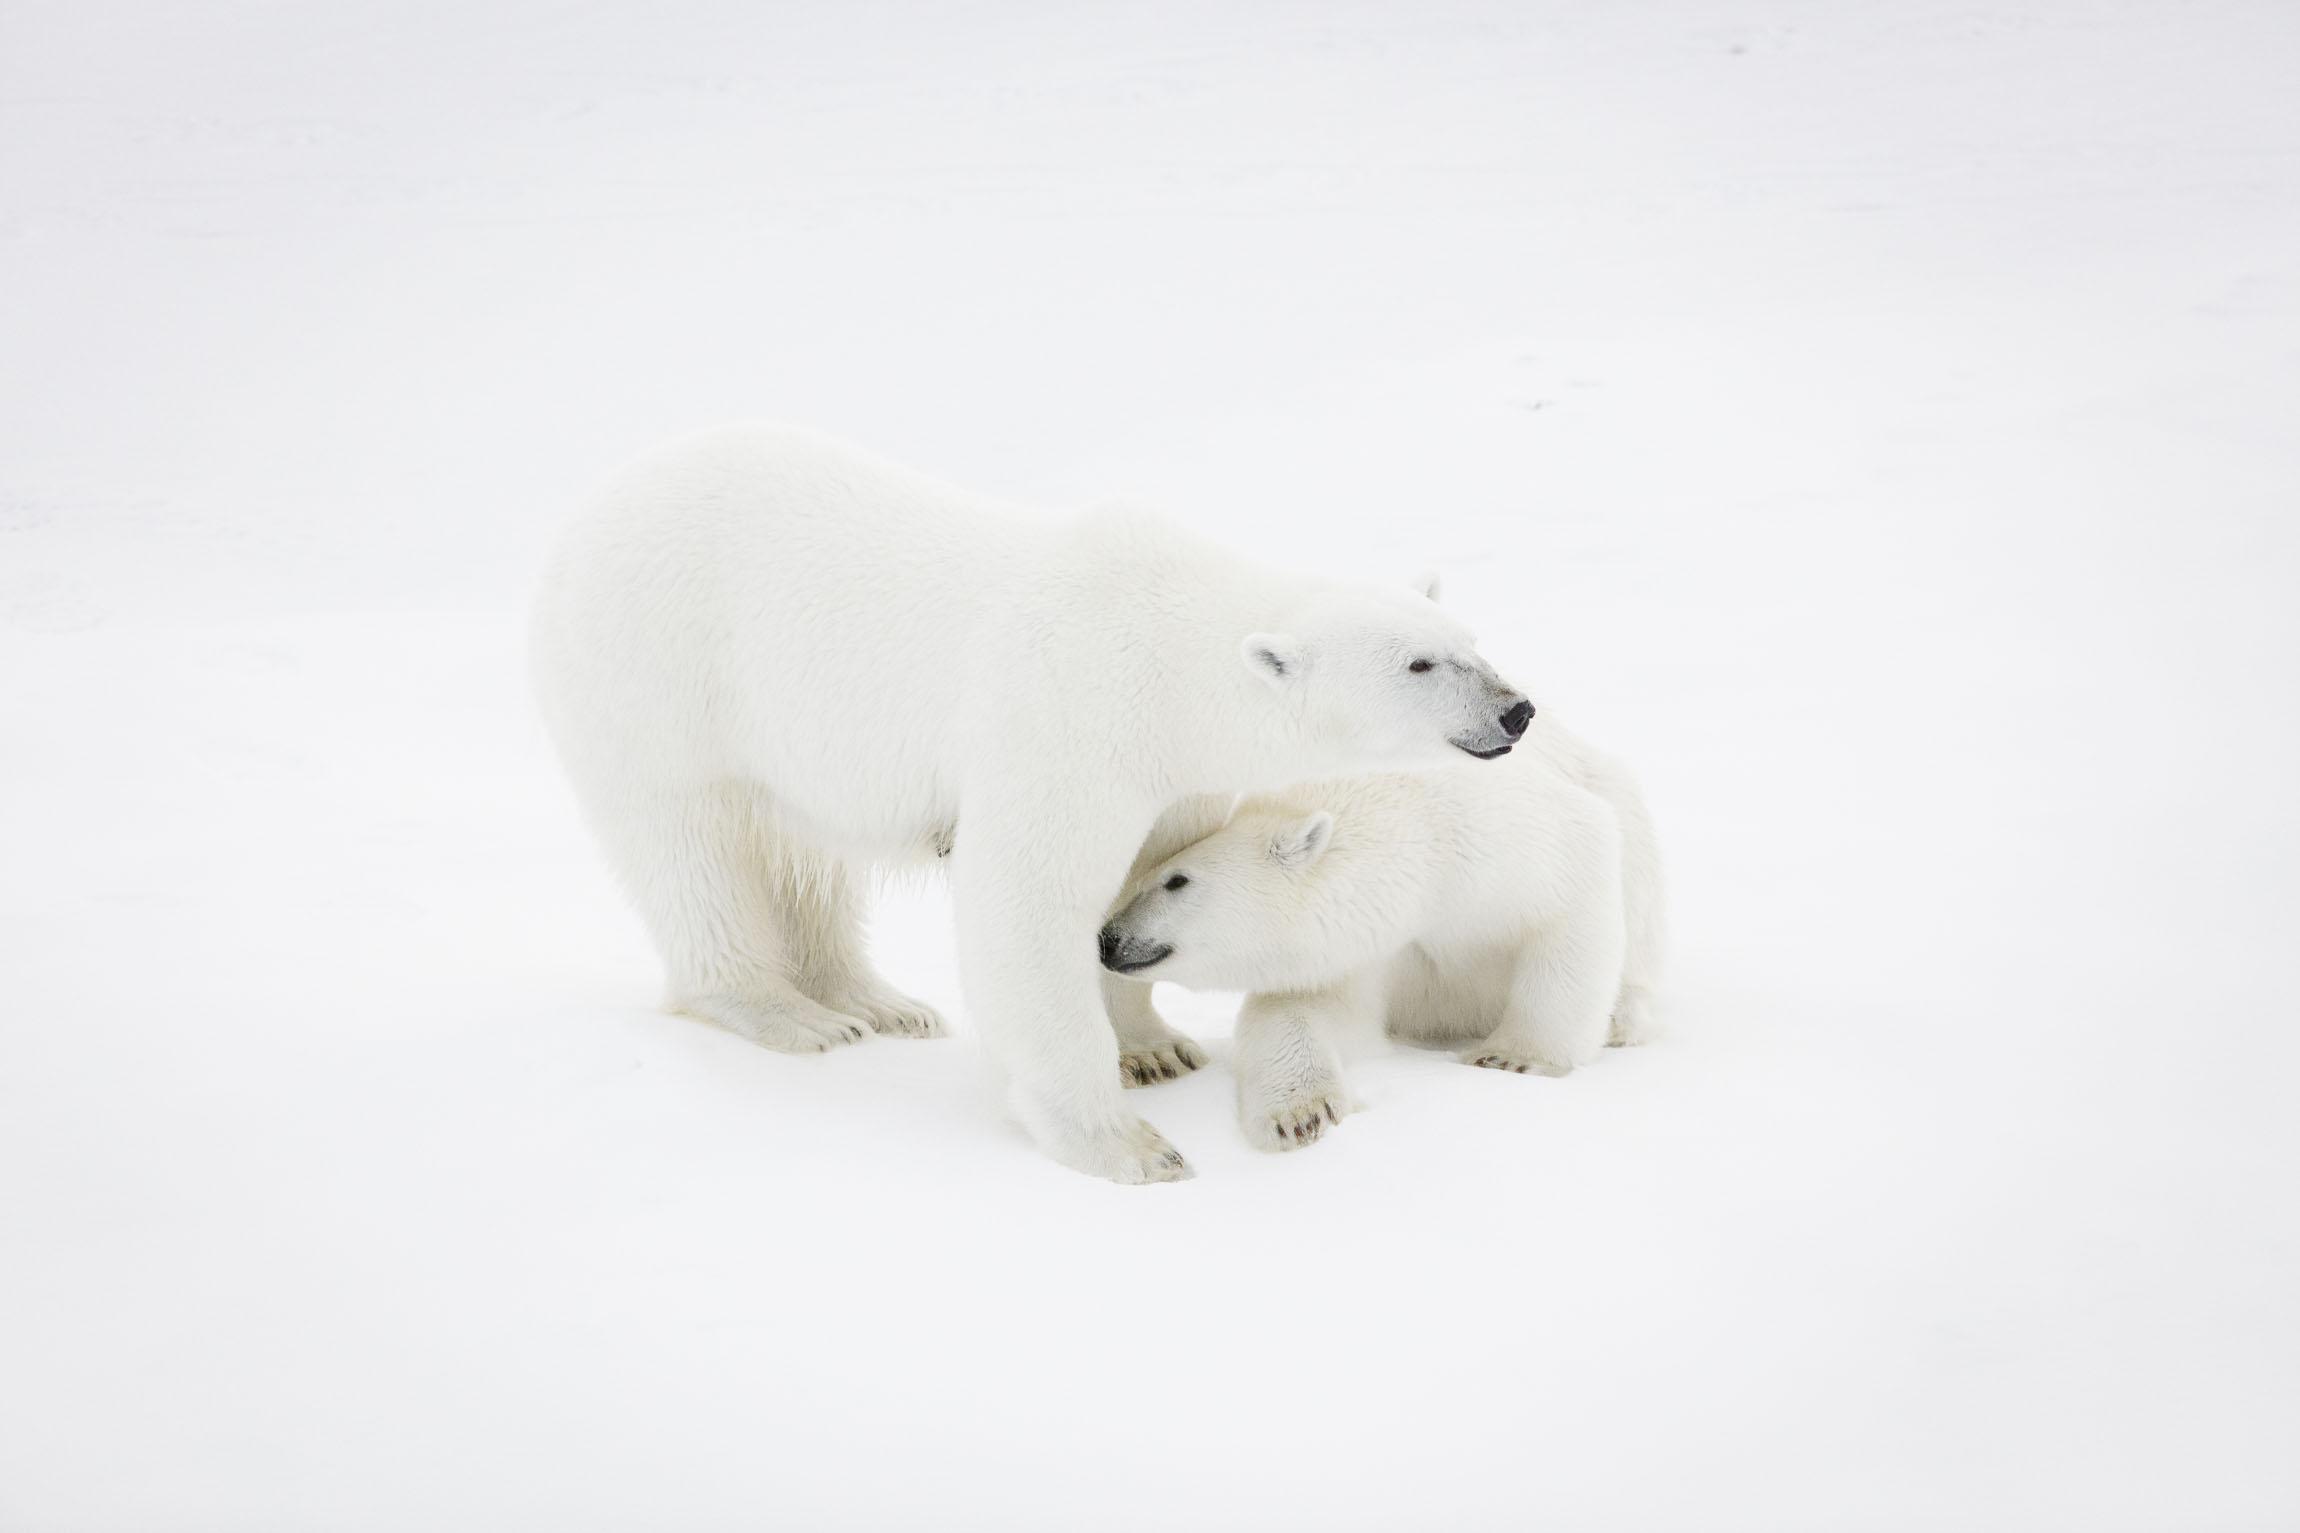 A mother polar bear and her cub on sea ice